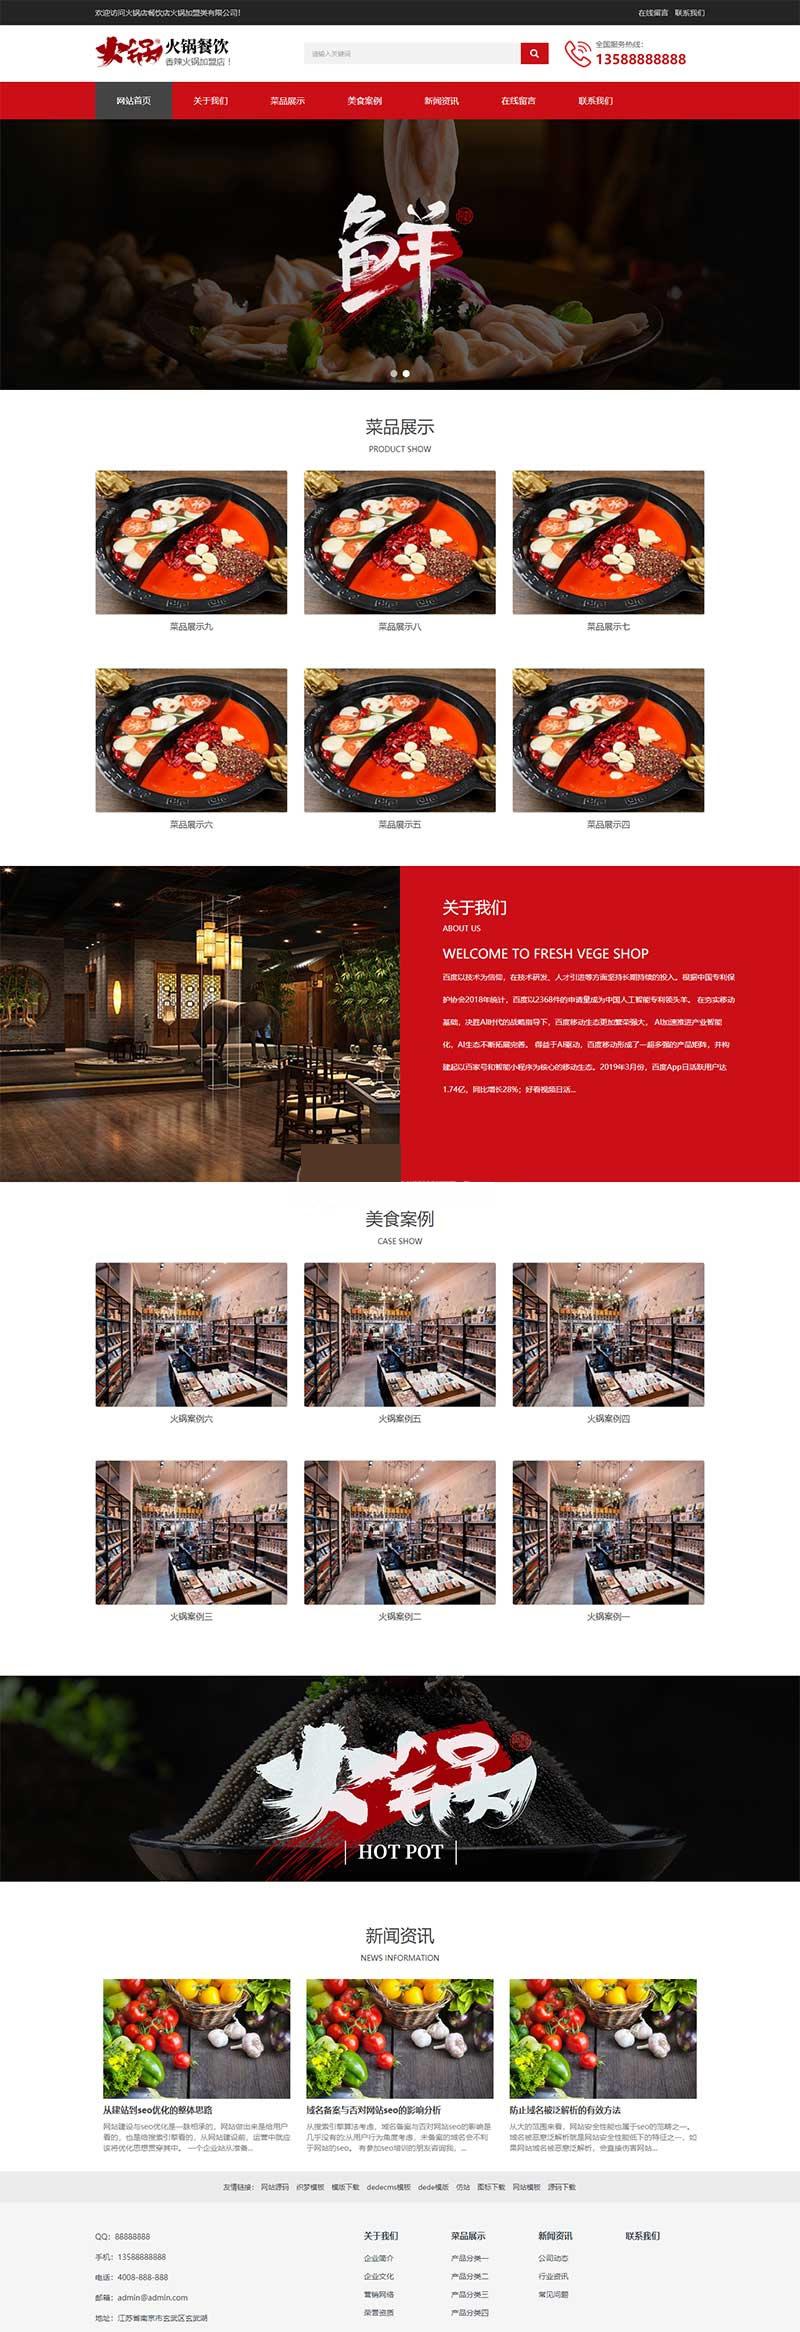 【DEDECMS模板】HTML5响应式火锅餐饮加盟店类网站源码自适应手机版[织梦内核]-找主题源码